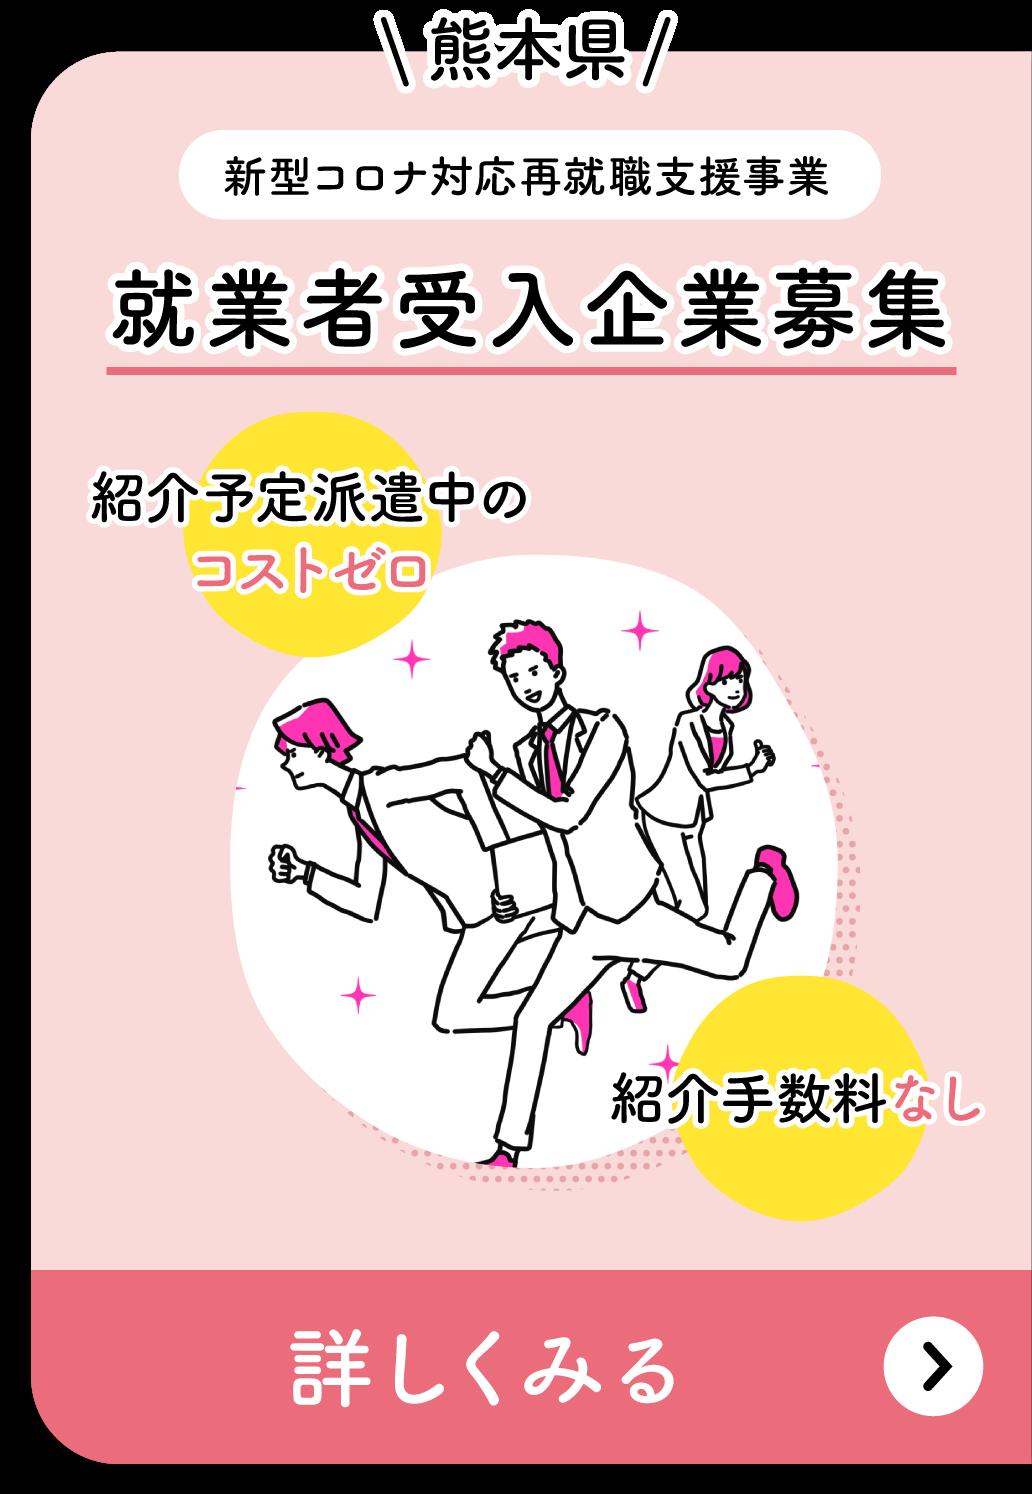 熊本県 新型コロナ対応再就職支援事業